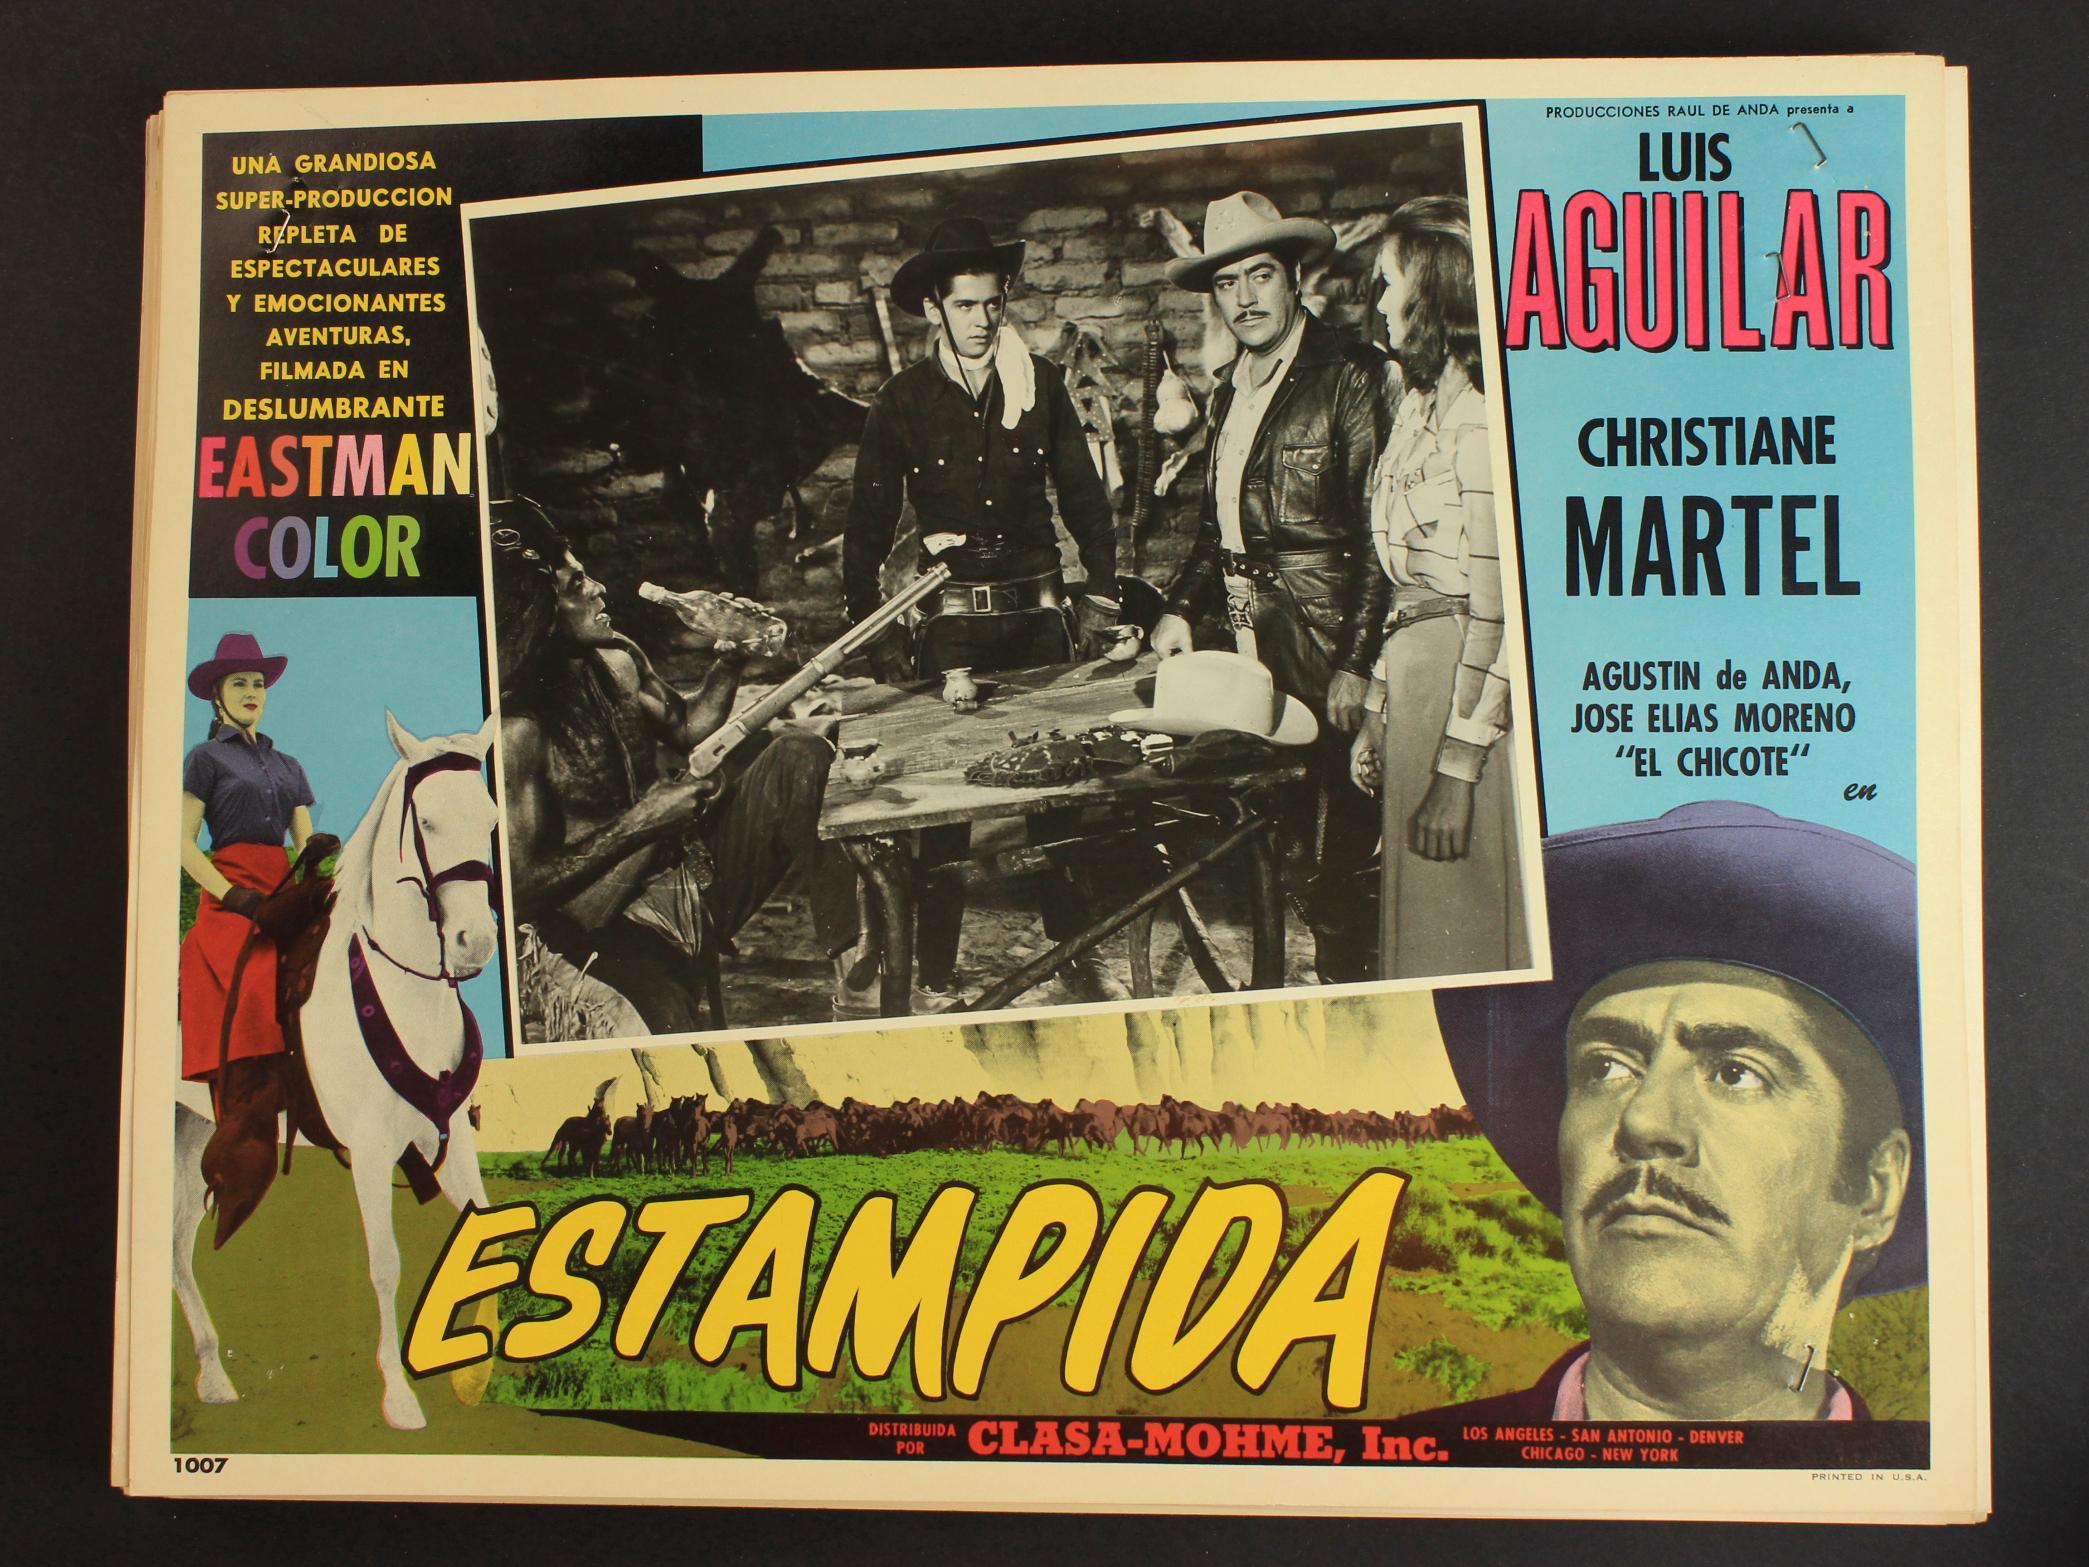 La estampida (1959)